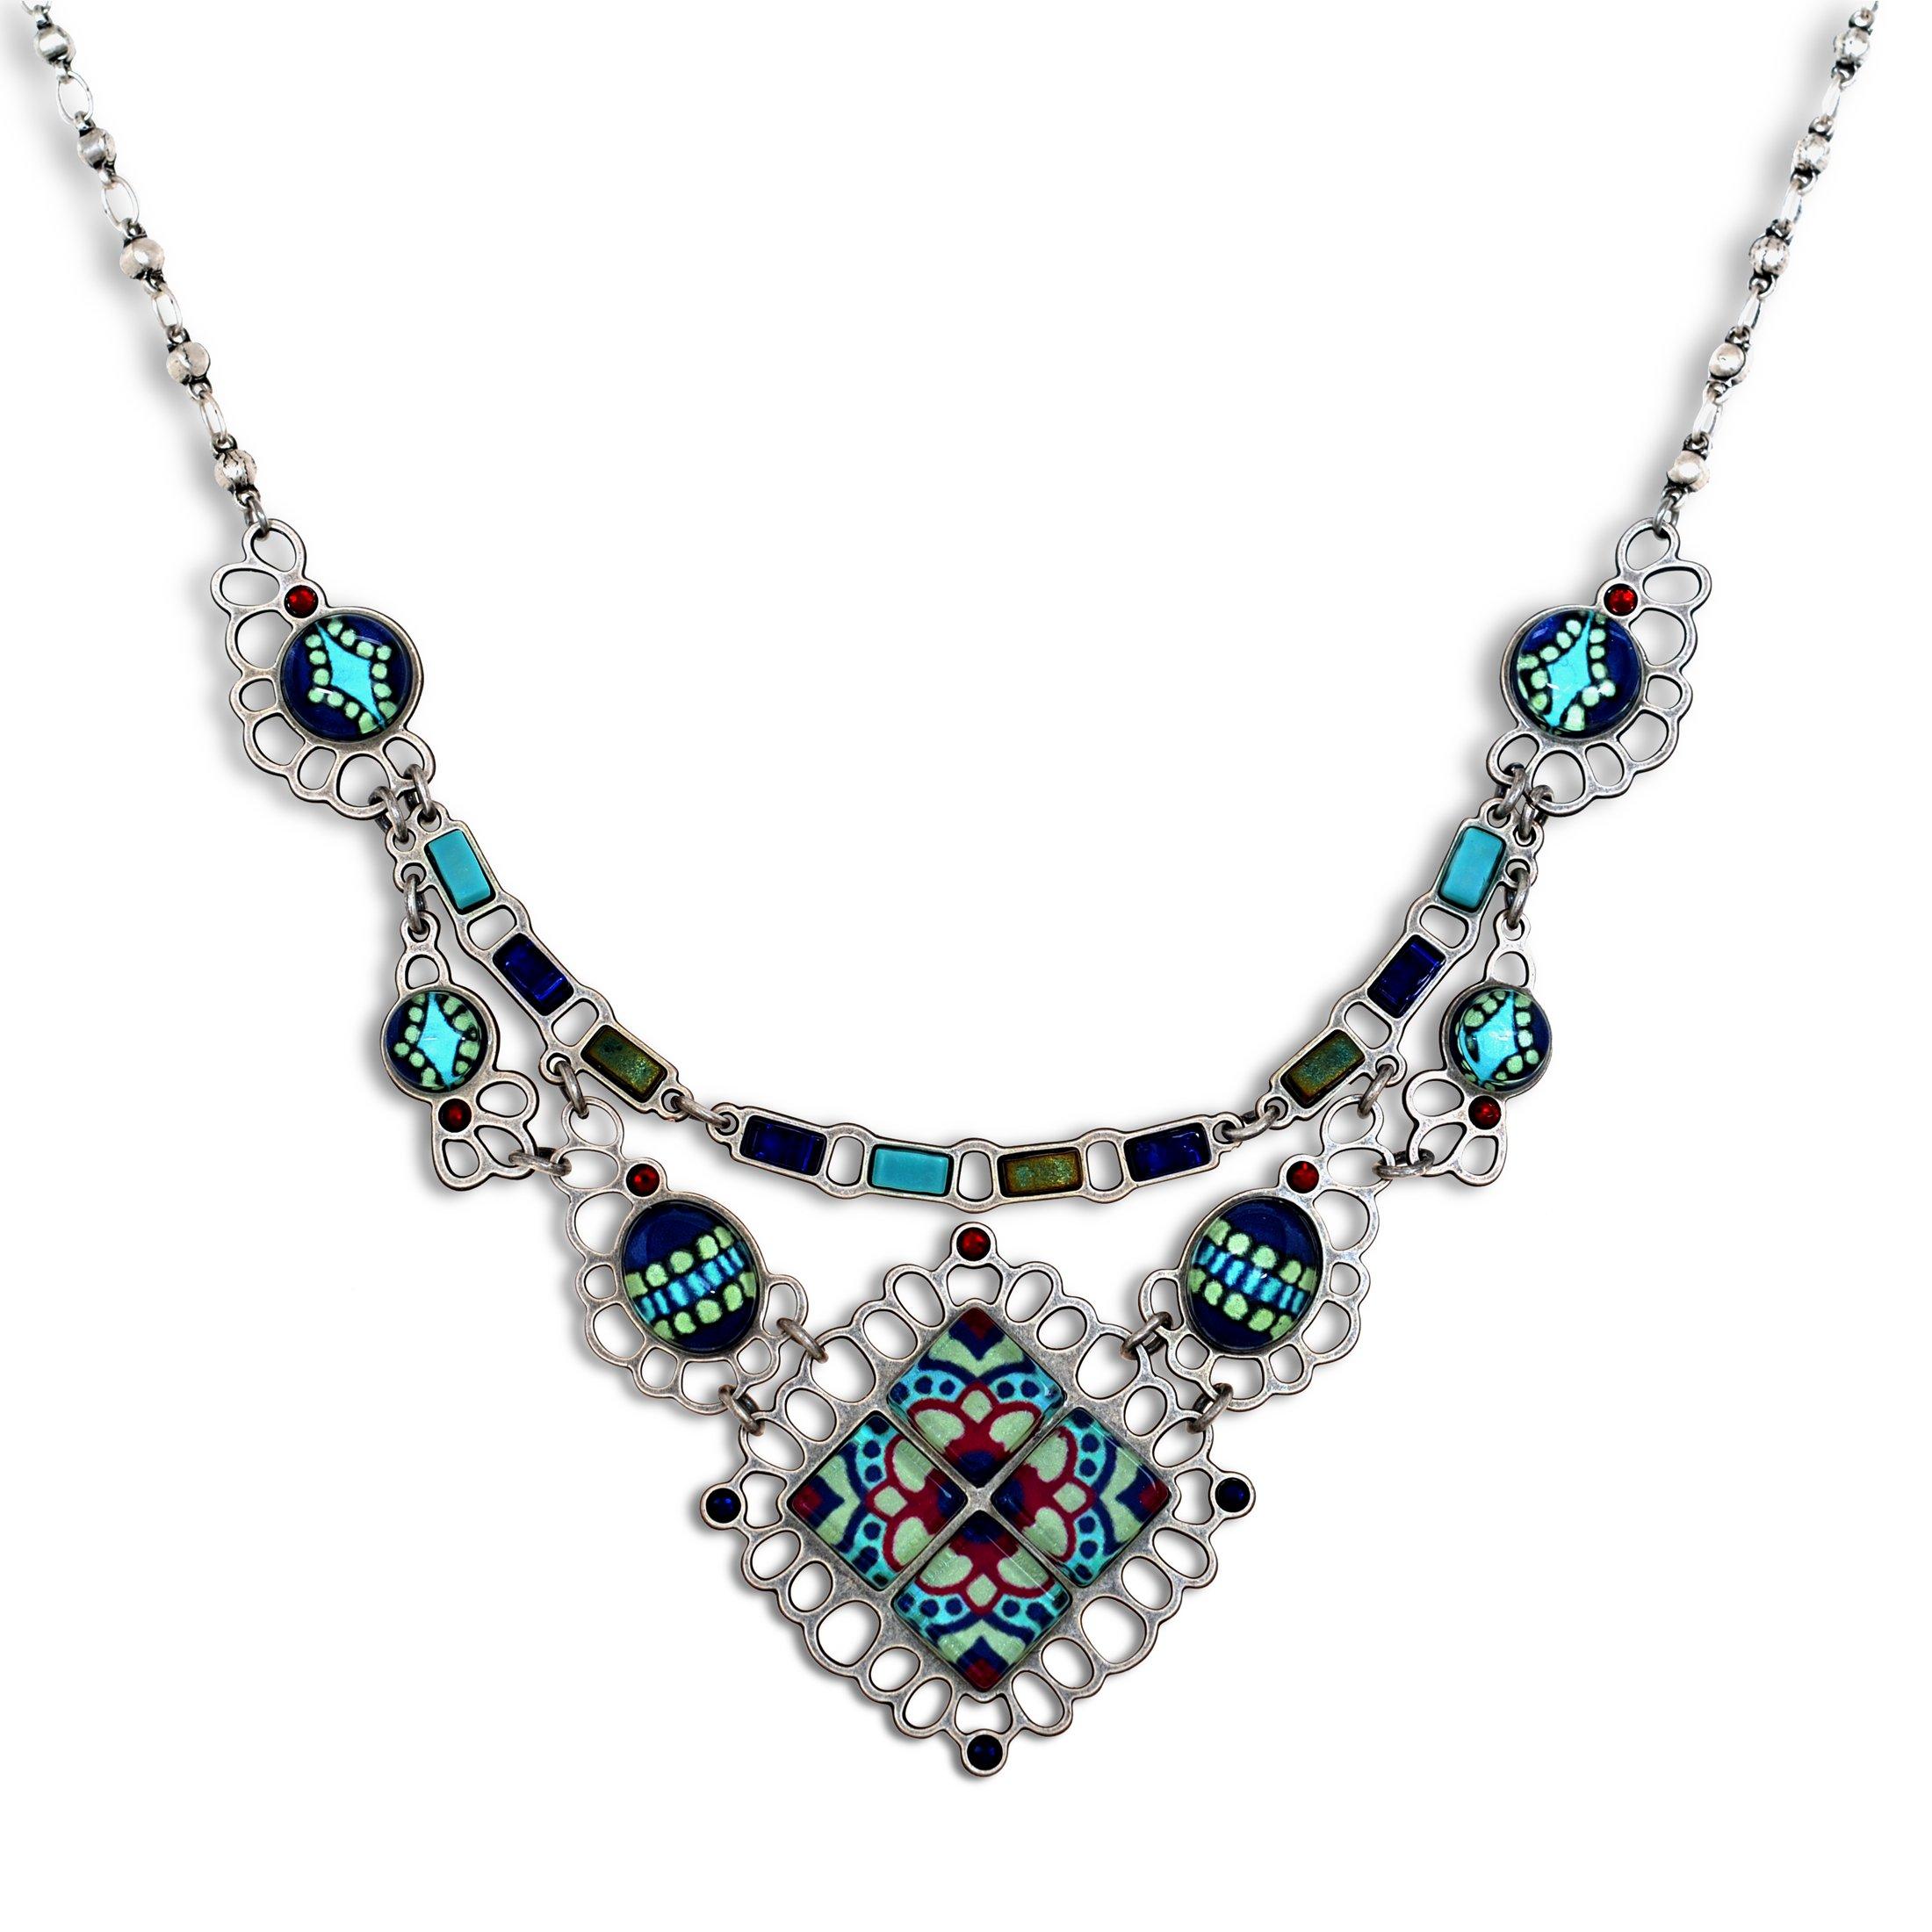 The Artazia Collection Artazia's Aegean-Sea Fashion Necklace, Spring-Summer - N4509